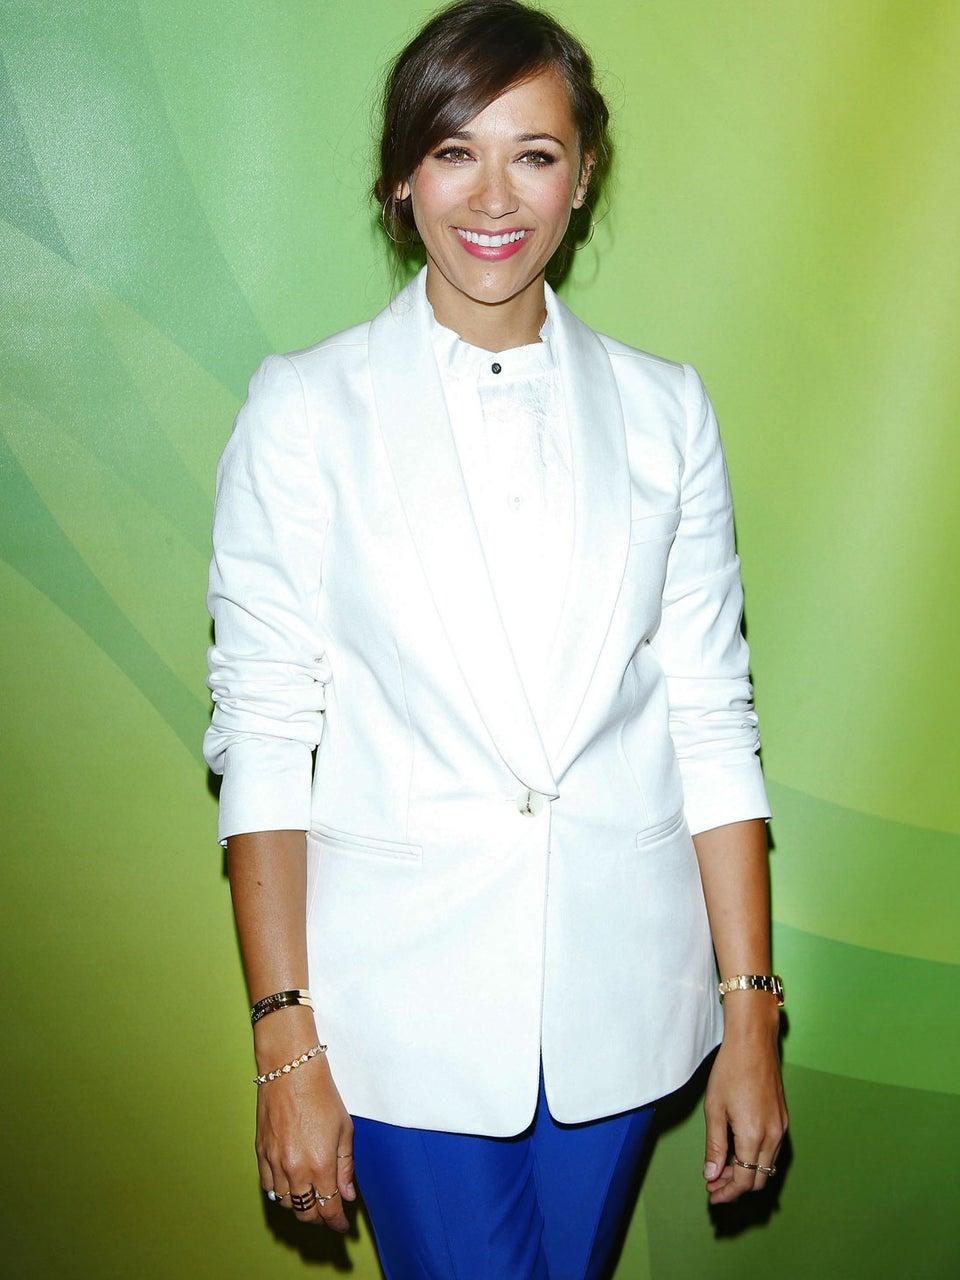 All In The Family: Rashida Jones To Play Tracee Ellis Ross'Sister on 'Black-ish'